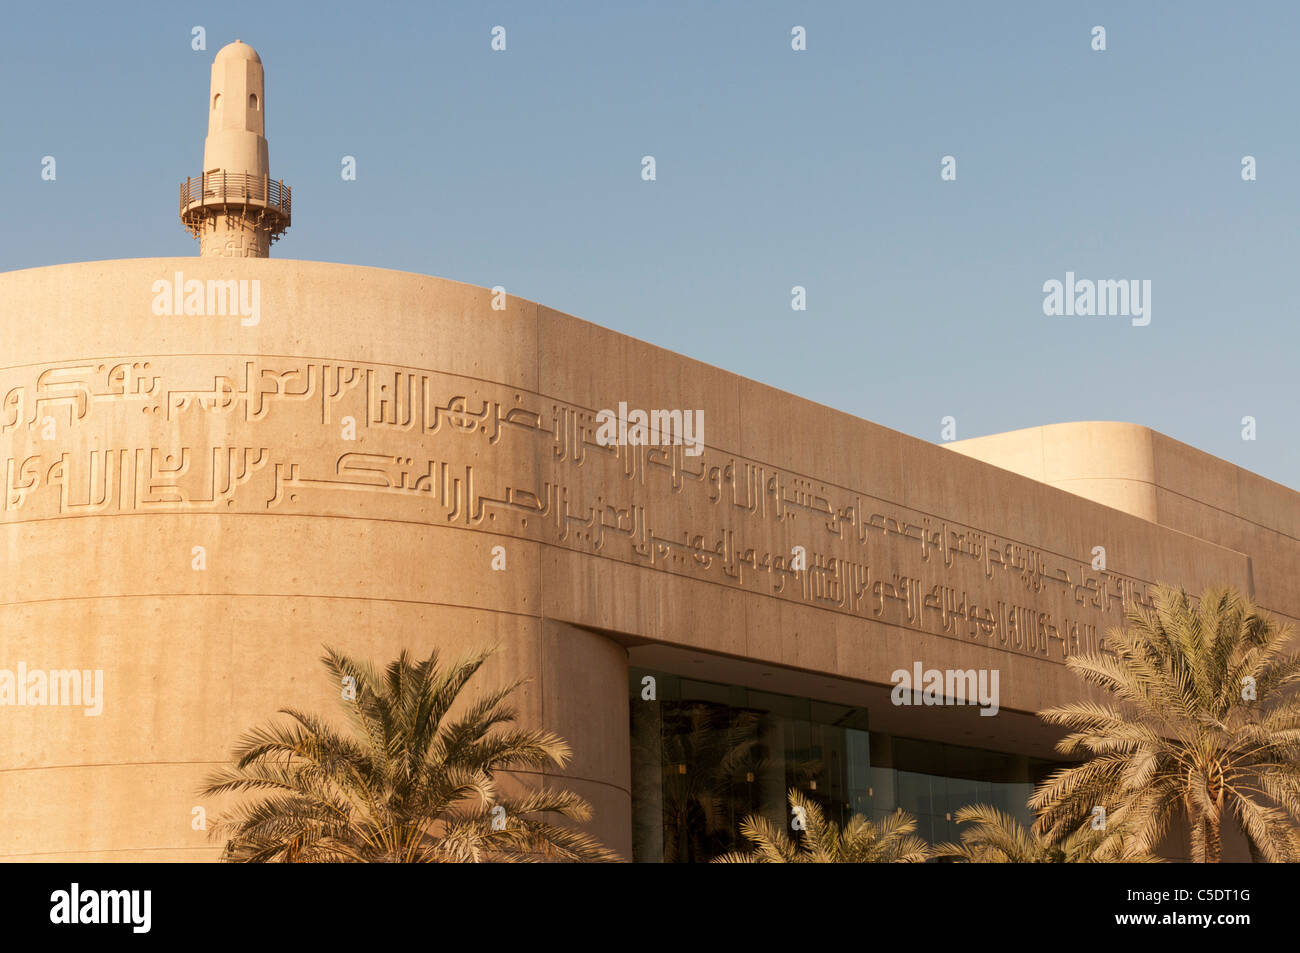 Bahreïn, Manama Elk204-1178, Beit al Quran Museum 1990 Photo Stock